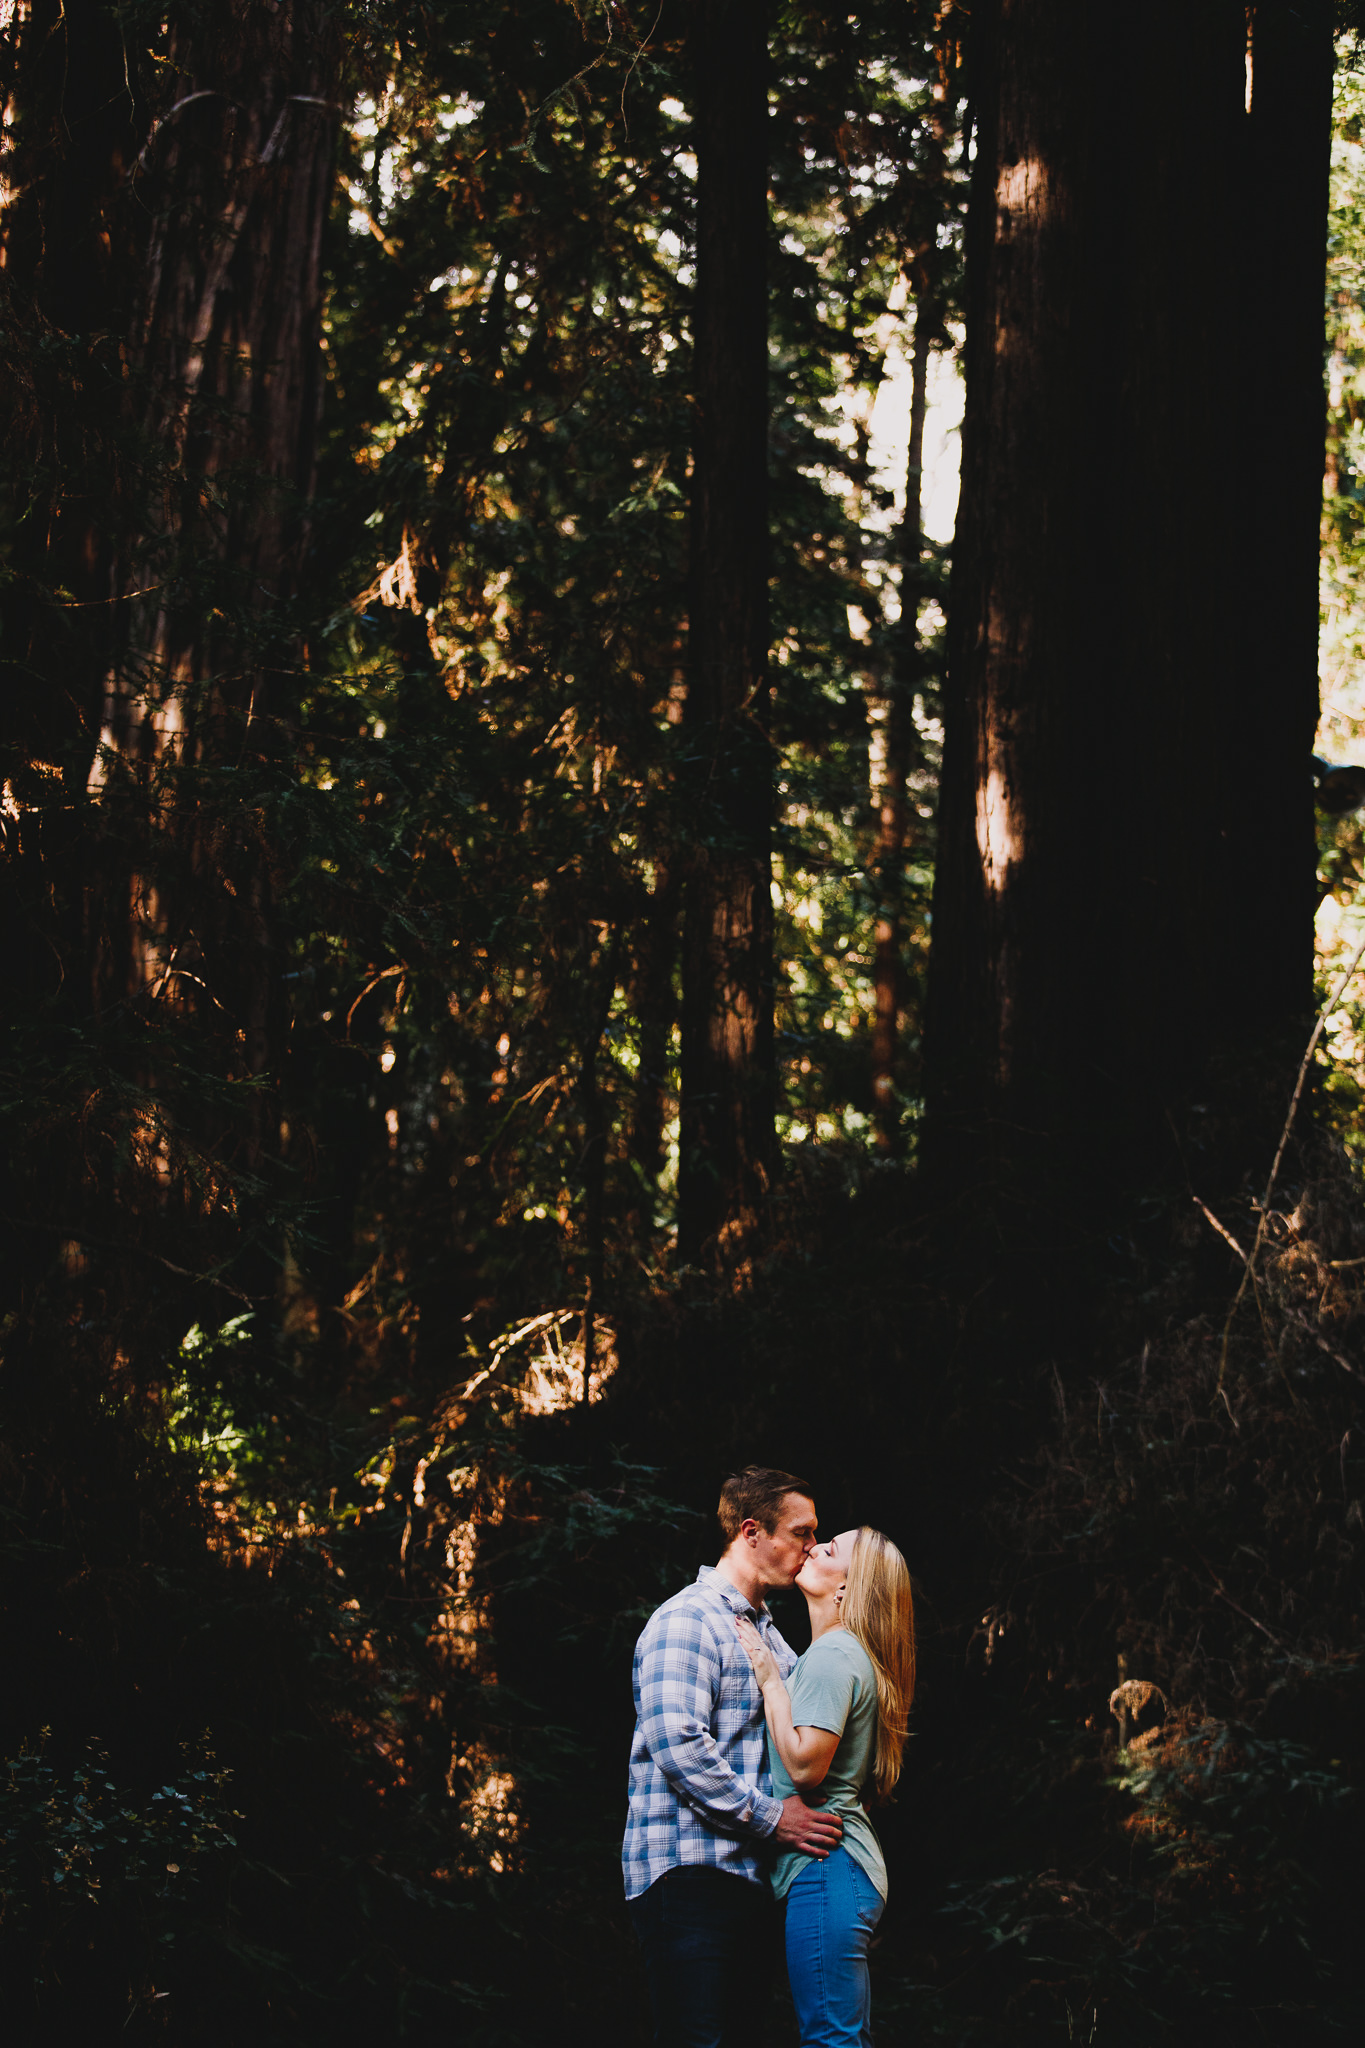 Archer Inspired Photography Michelle JJ Big Sur Wedding Engagement California Central Coast Lifestyle Documentary Photographer-65.jpg